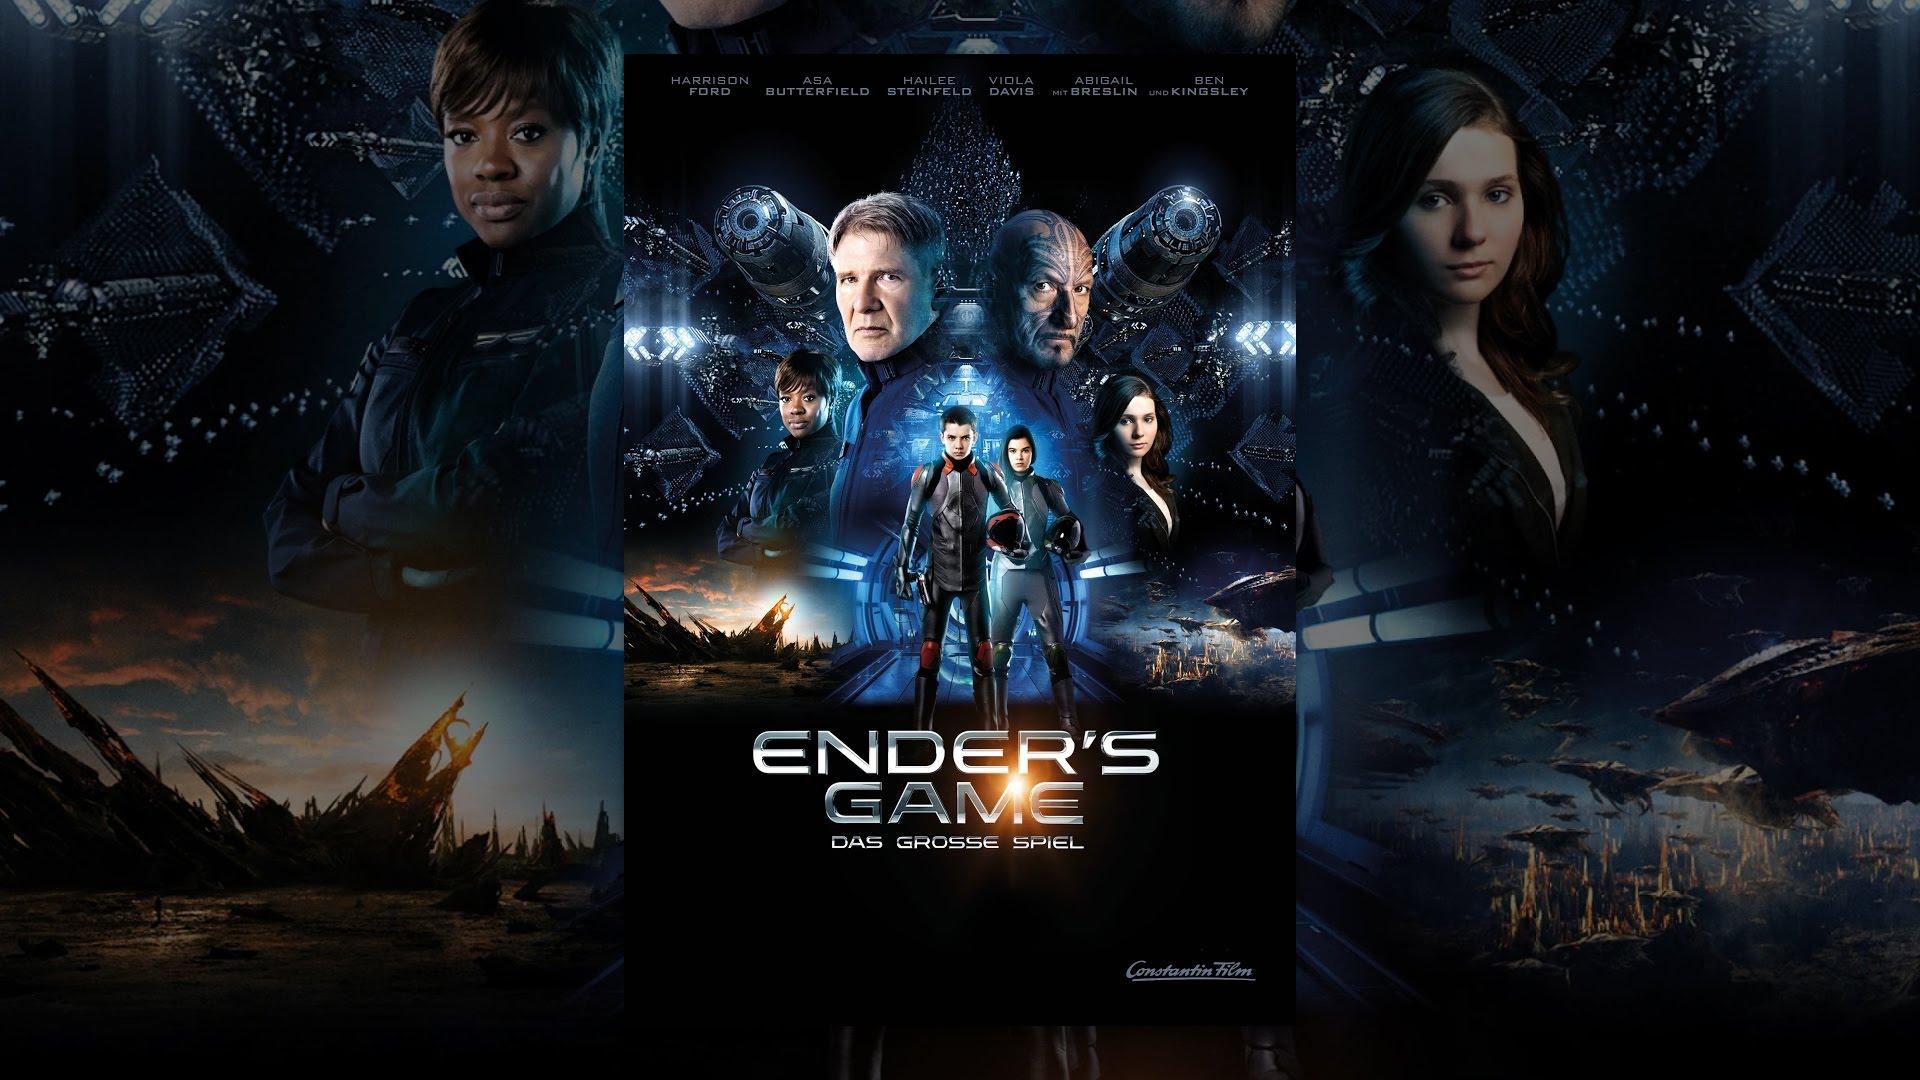 Enders Game - Das große Spiel